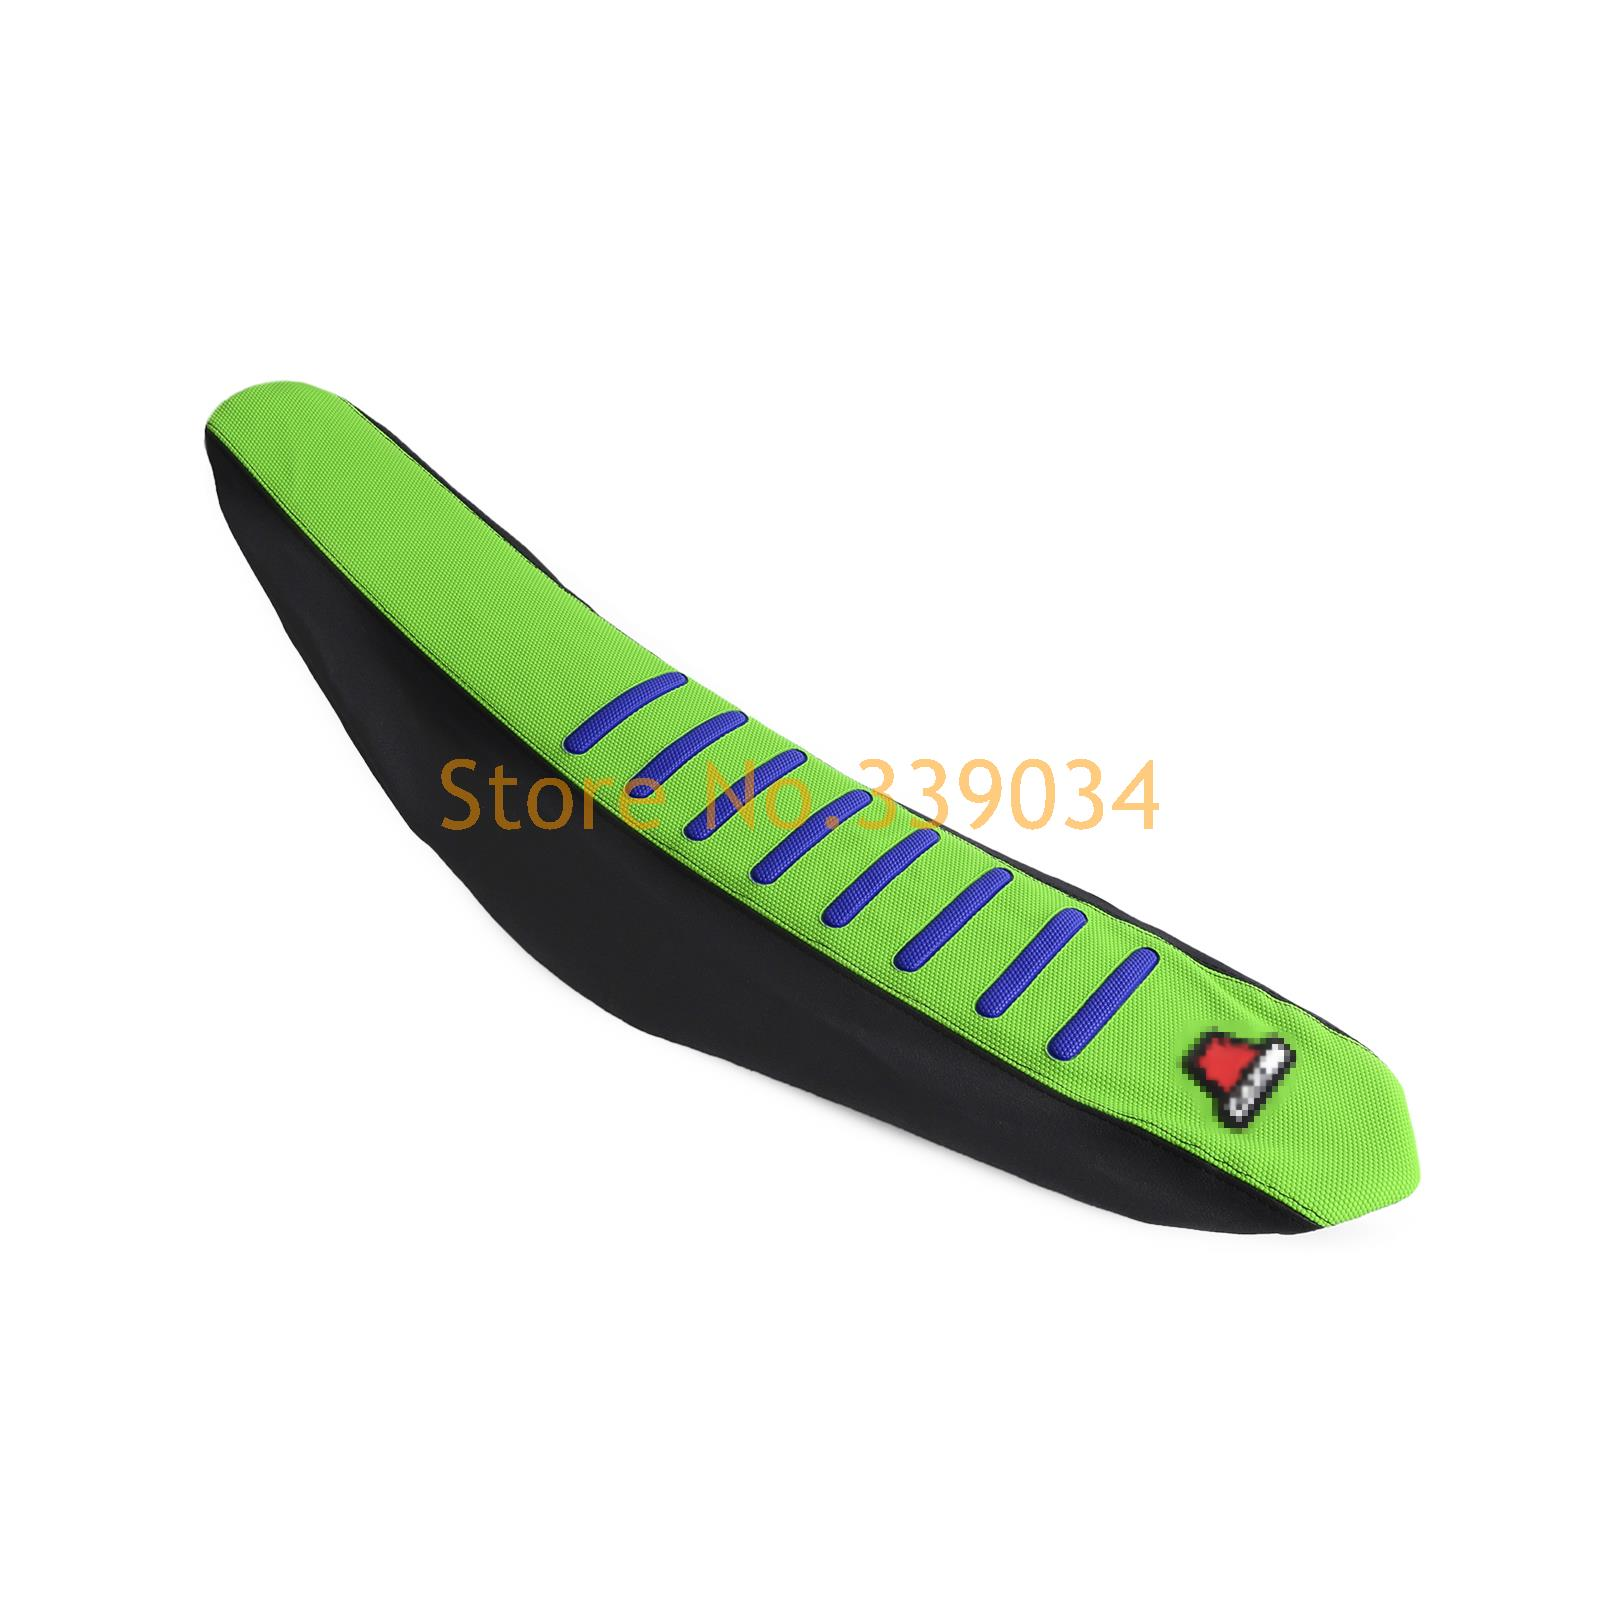 Durable Gripper Seat Cover Green For Kawasaki KX250F 2013 2014 2015 2016 KX450F 2012-2015